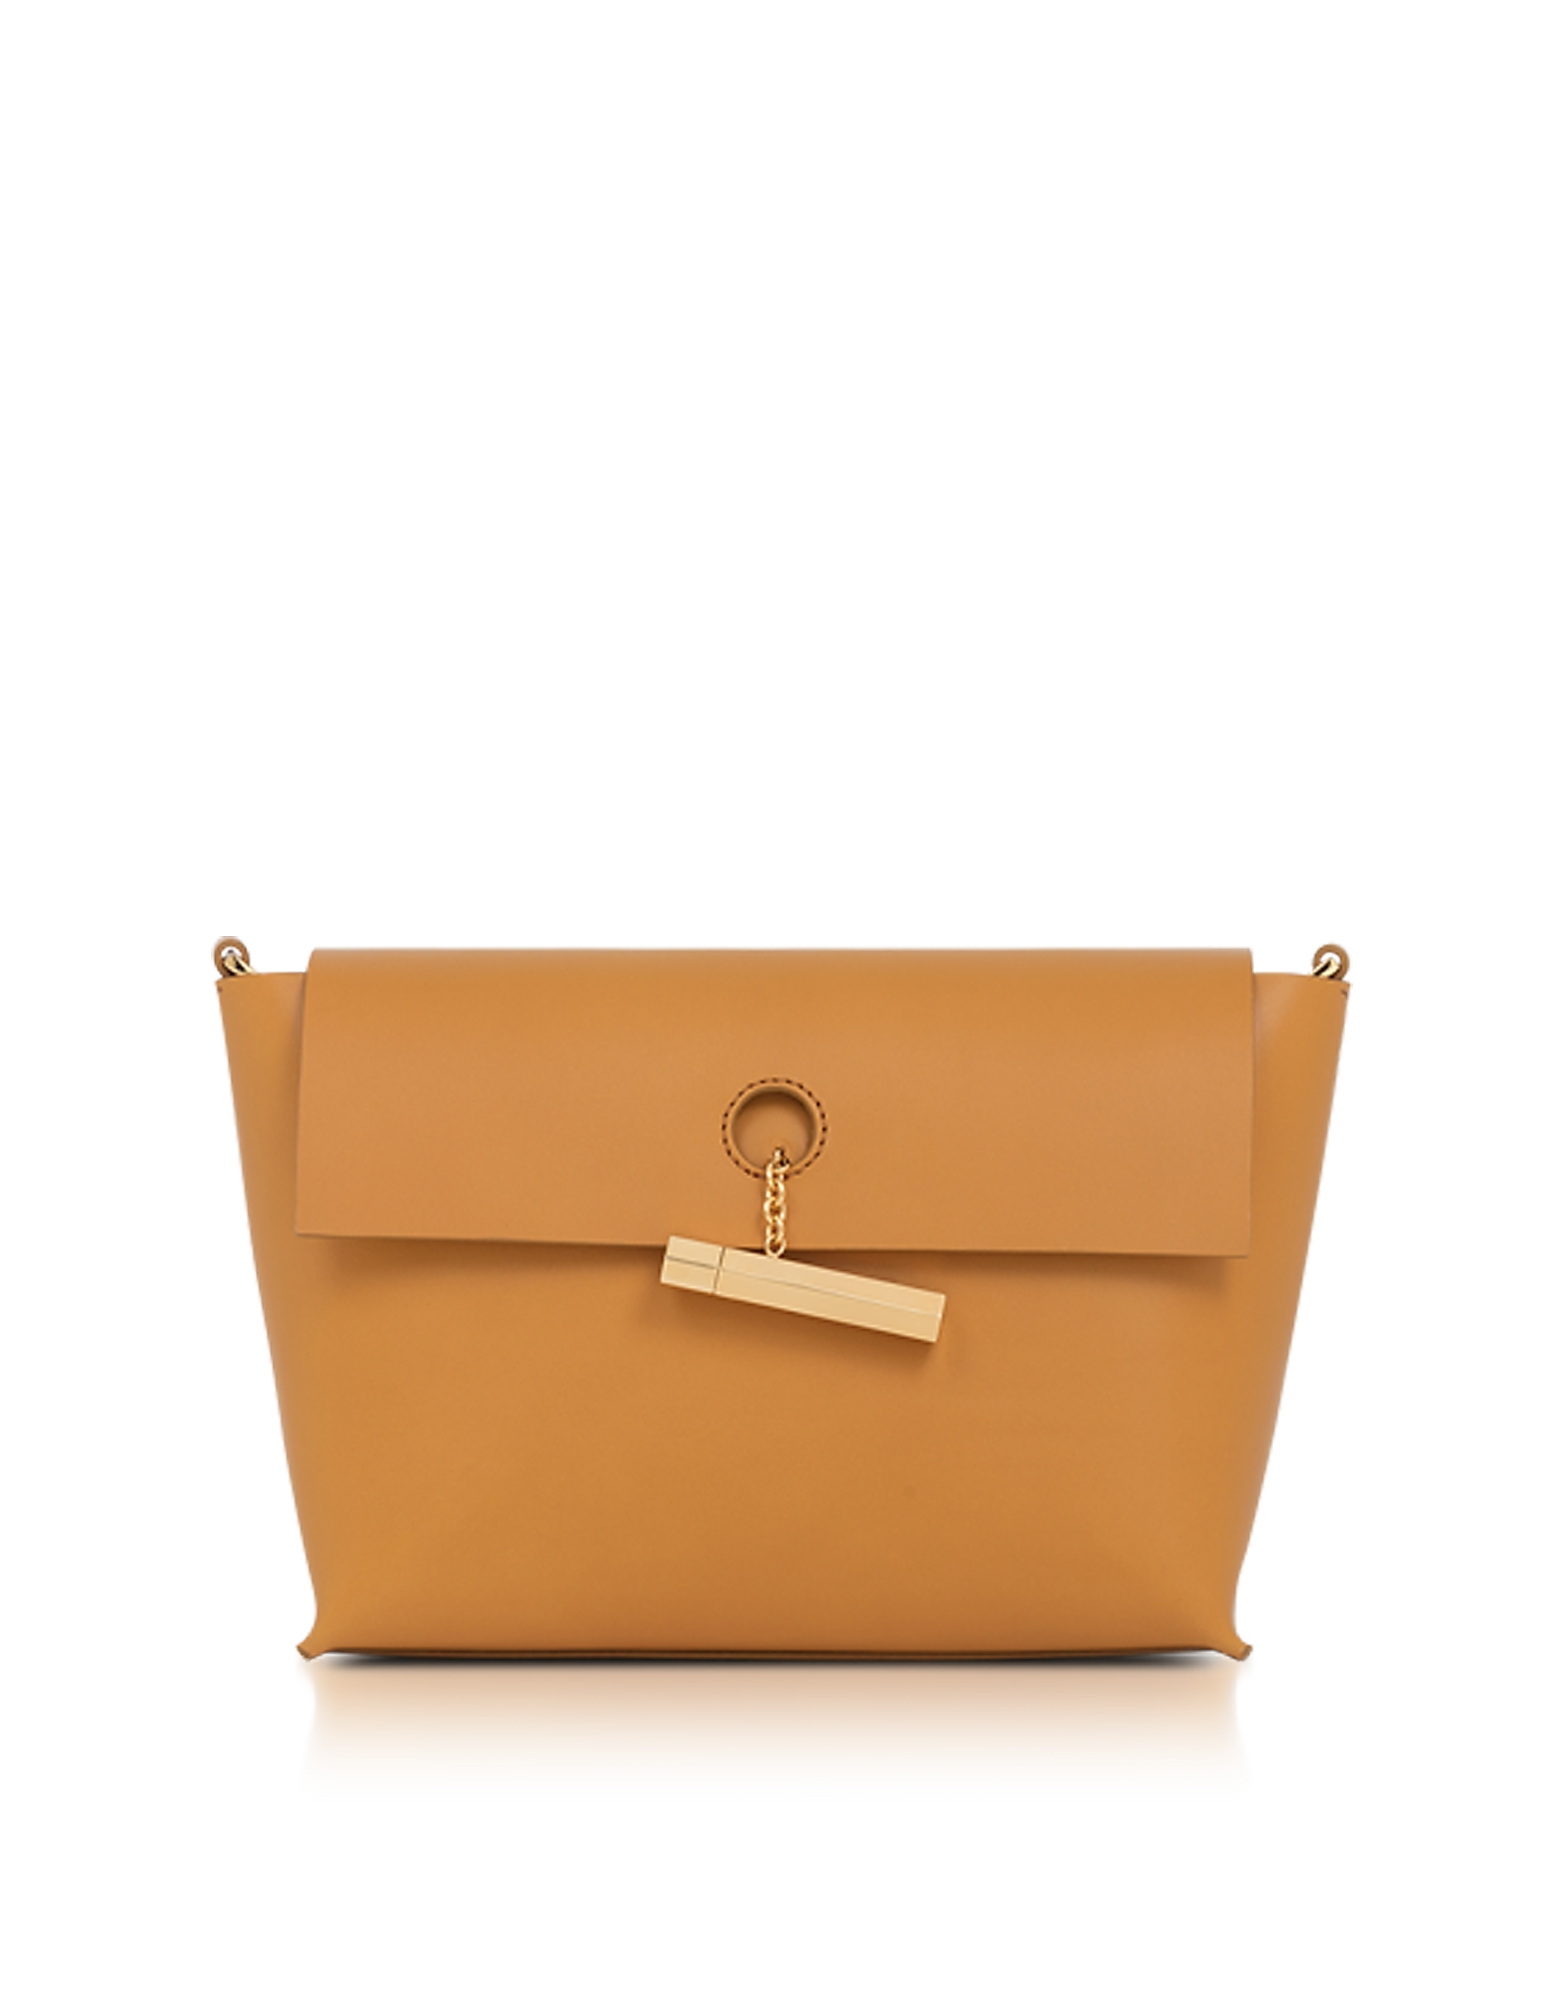 Sophie Hulme Handbags, Dark Butter Pinch Crossbody Bag